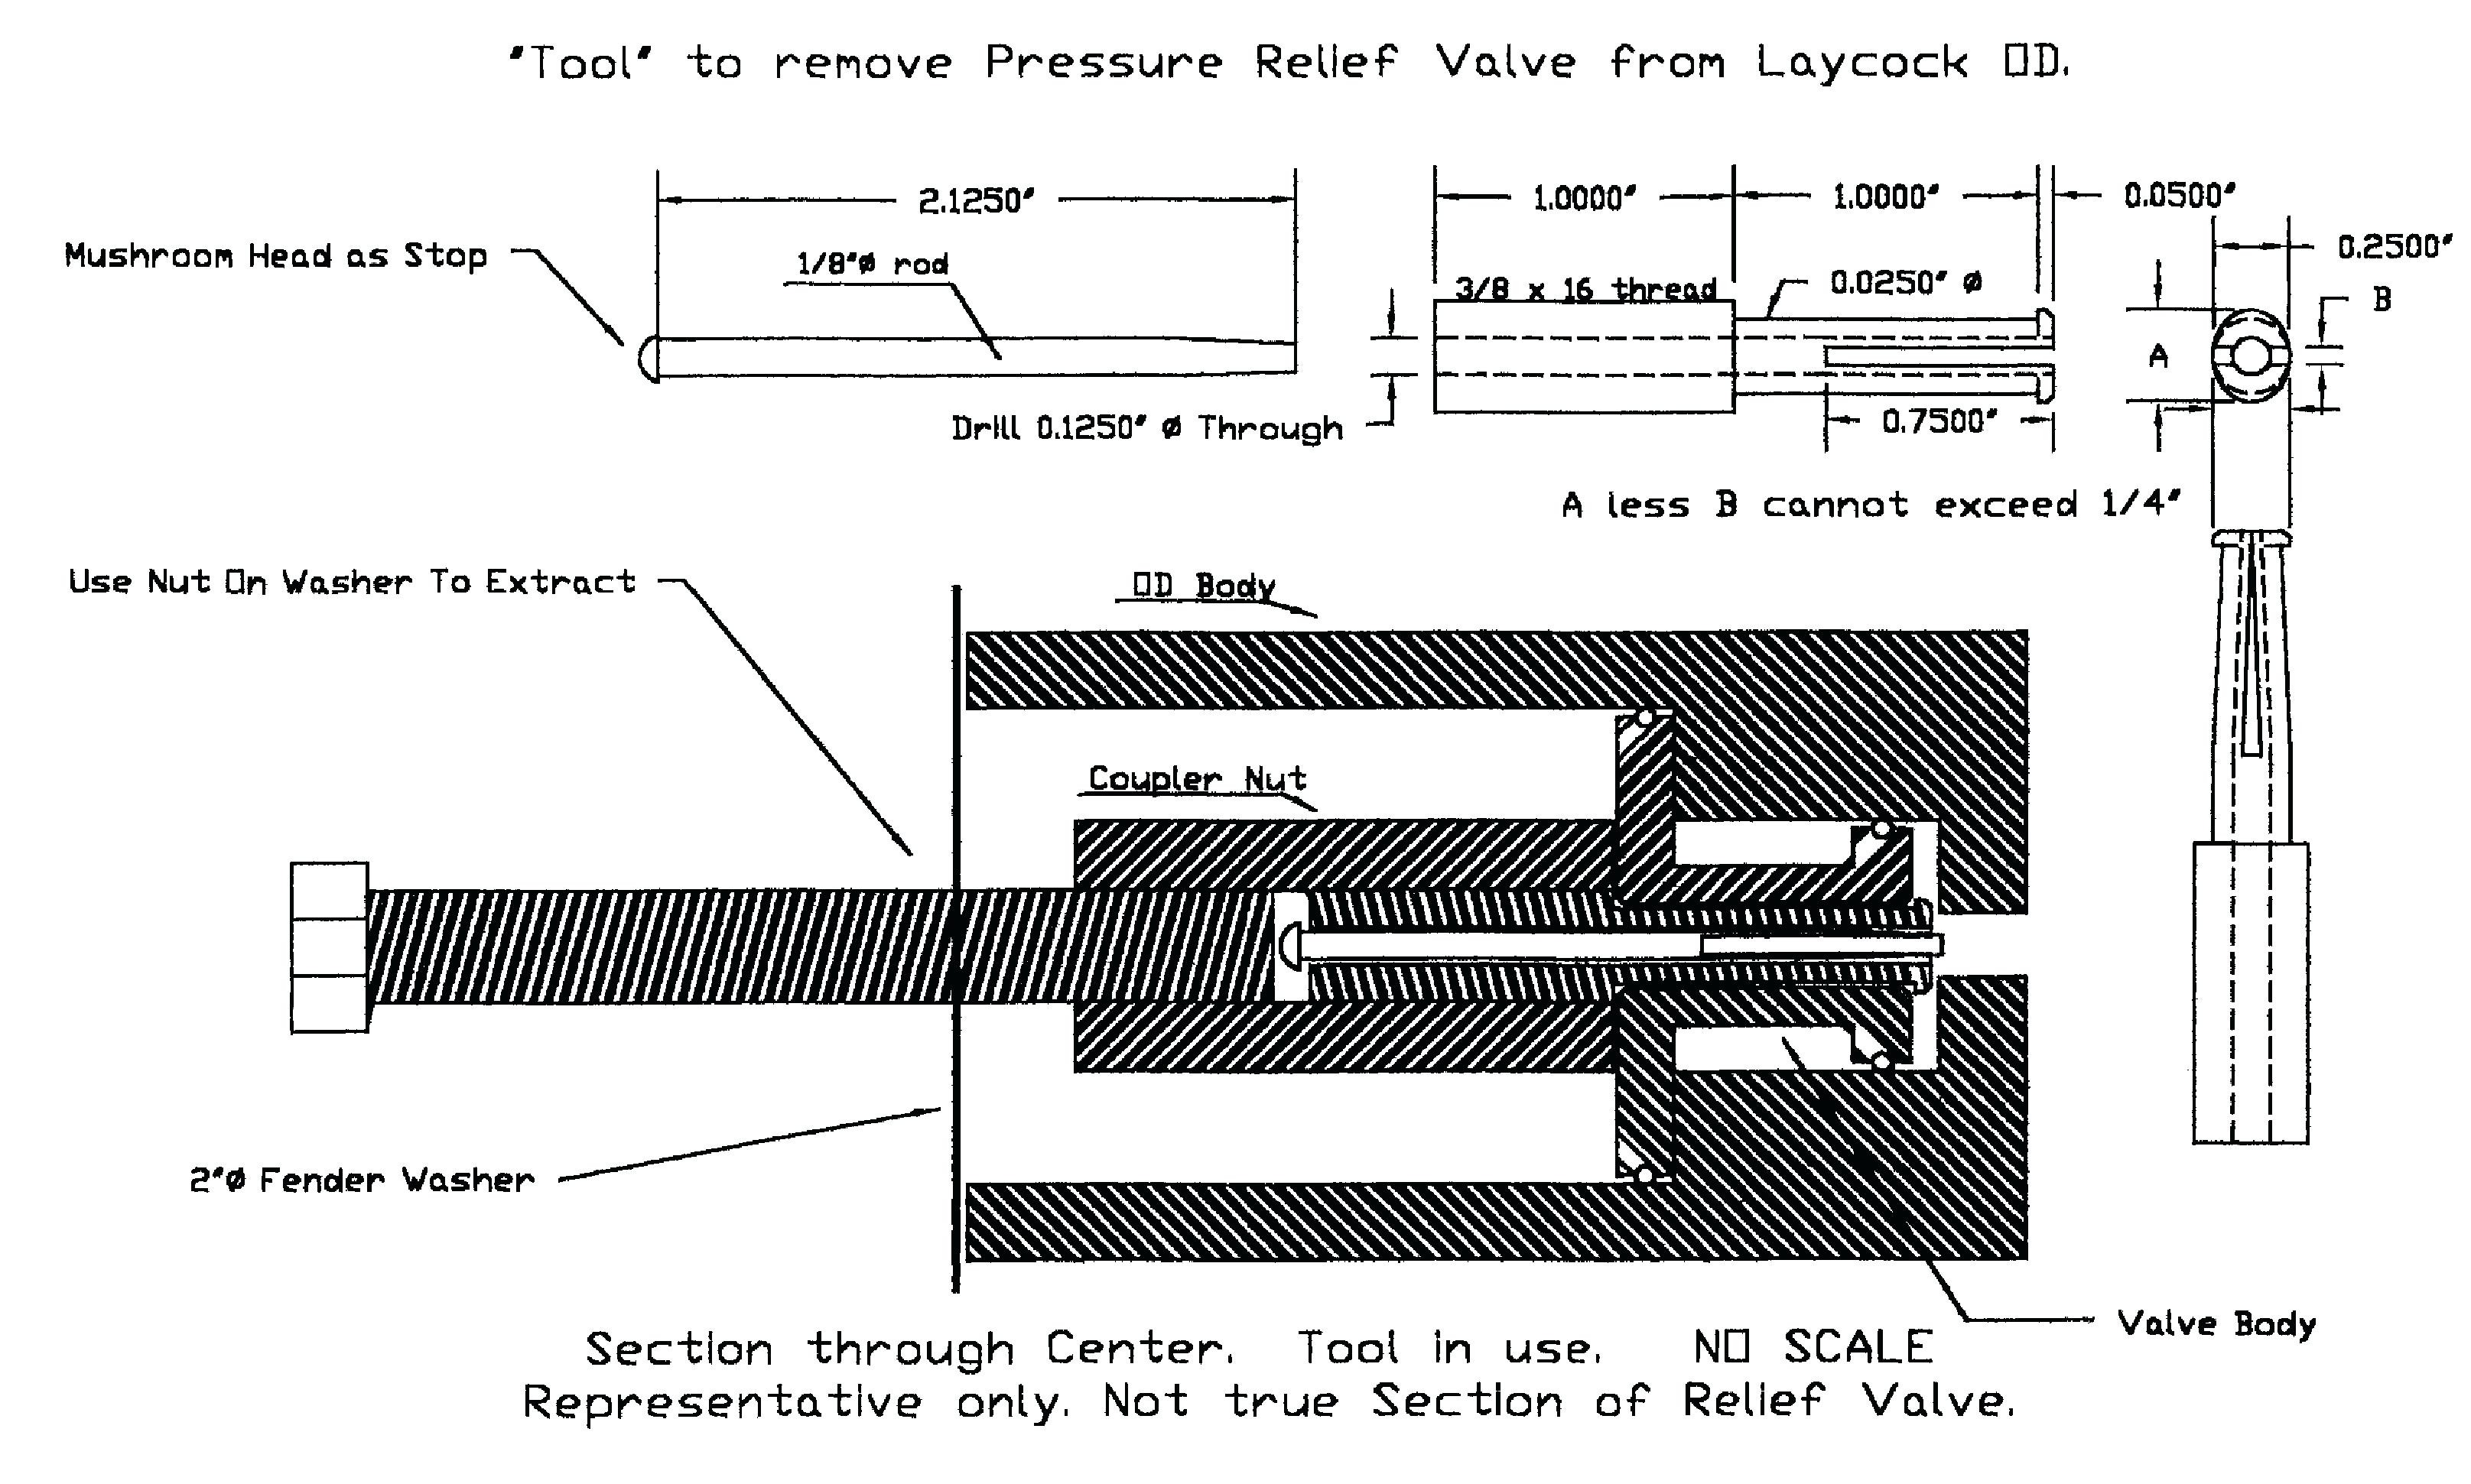 Wiring Diagram software New | Wiring Diagram Image